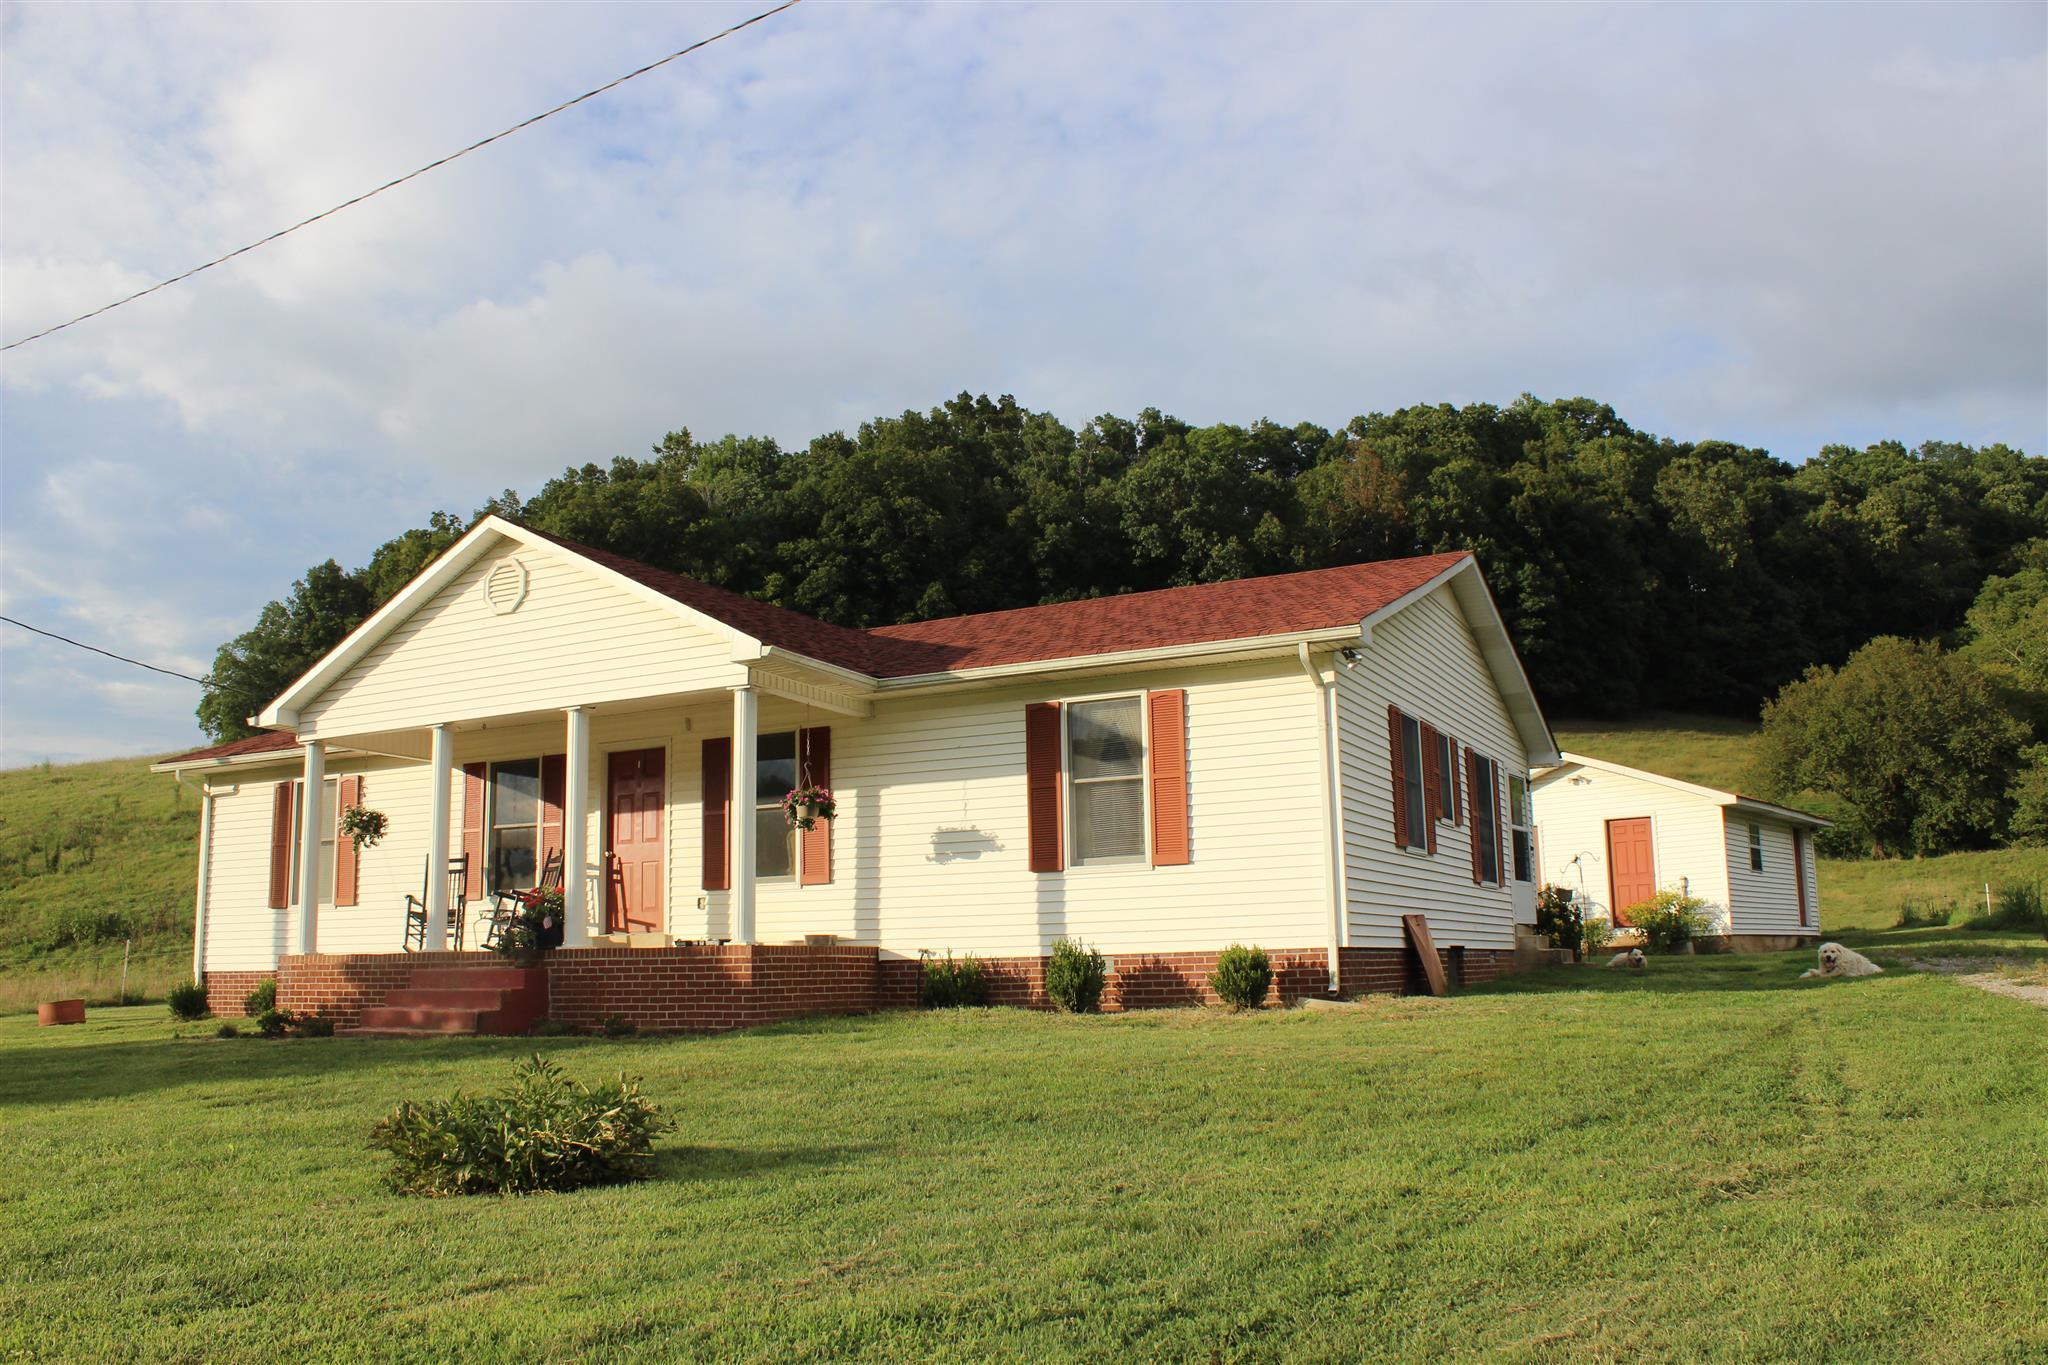 1695 DRY WEAKLY, Ethridge, TN 38456